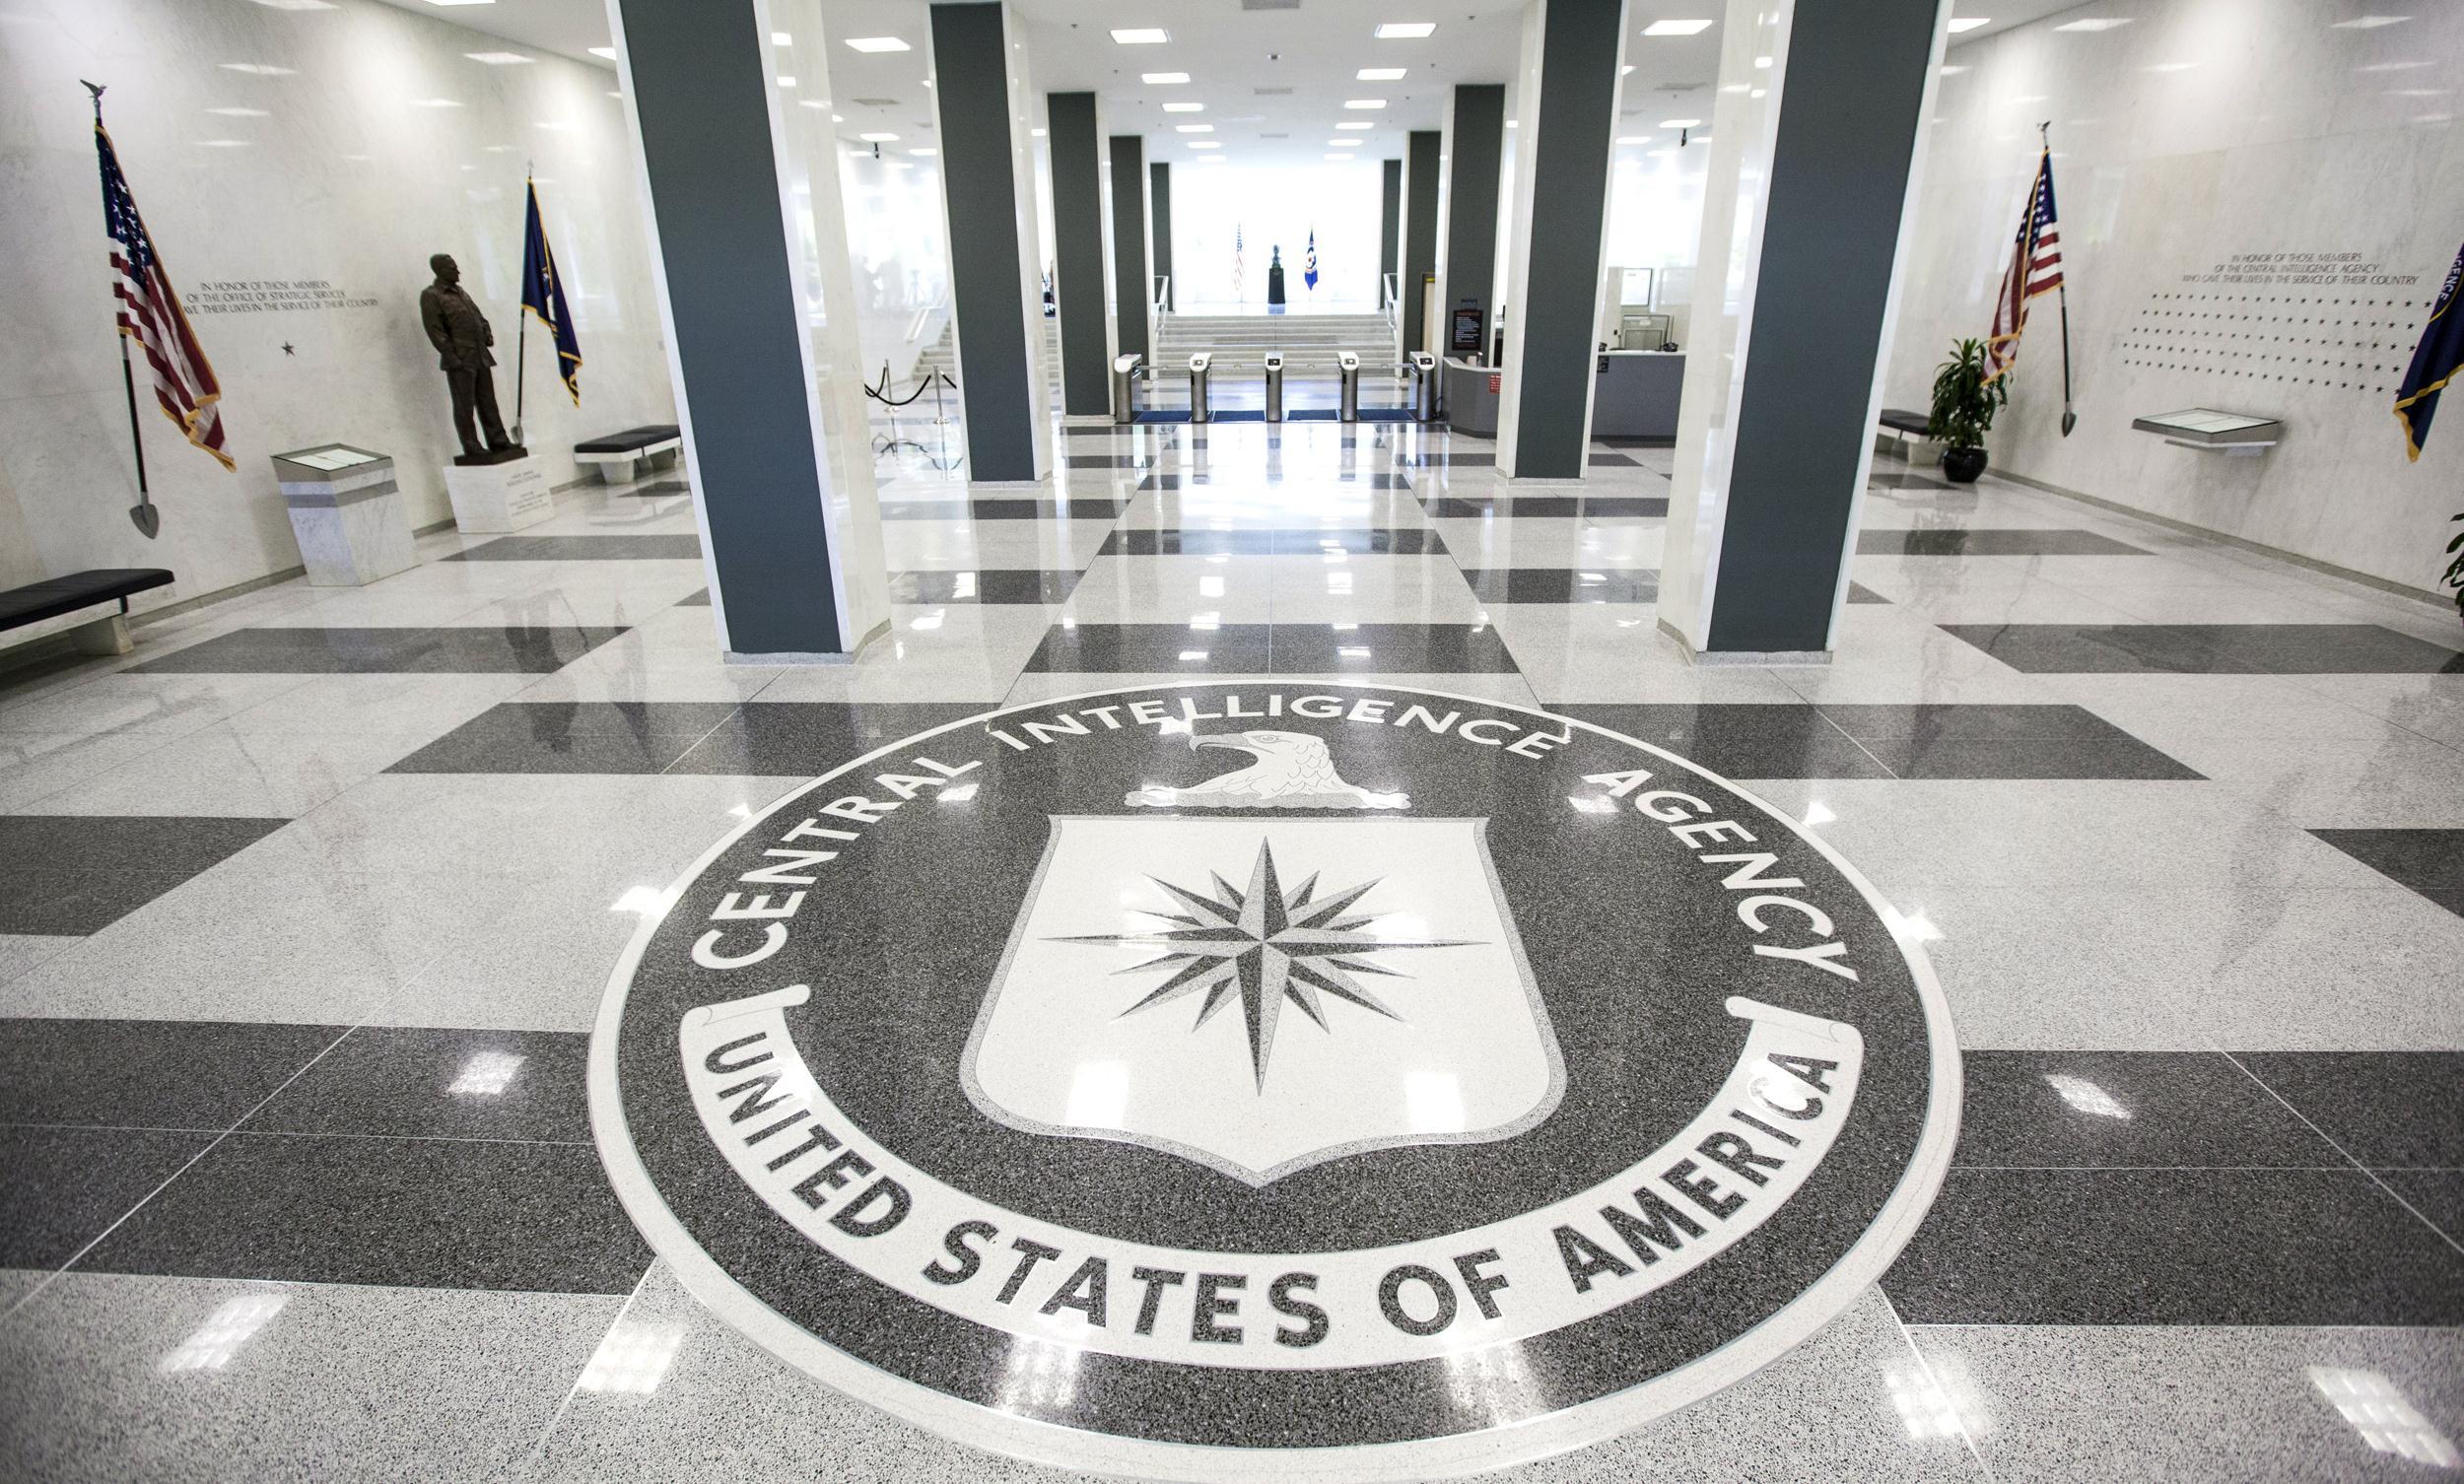 Глава ЦРУ заявил о «пристающих к Америке» русских